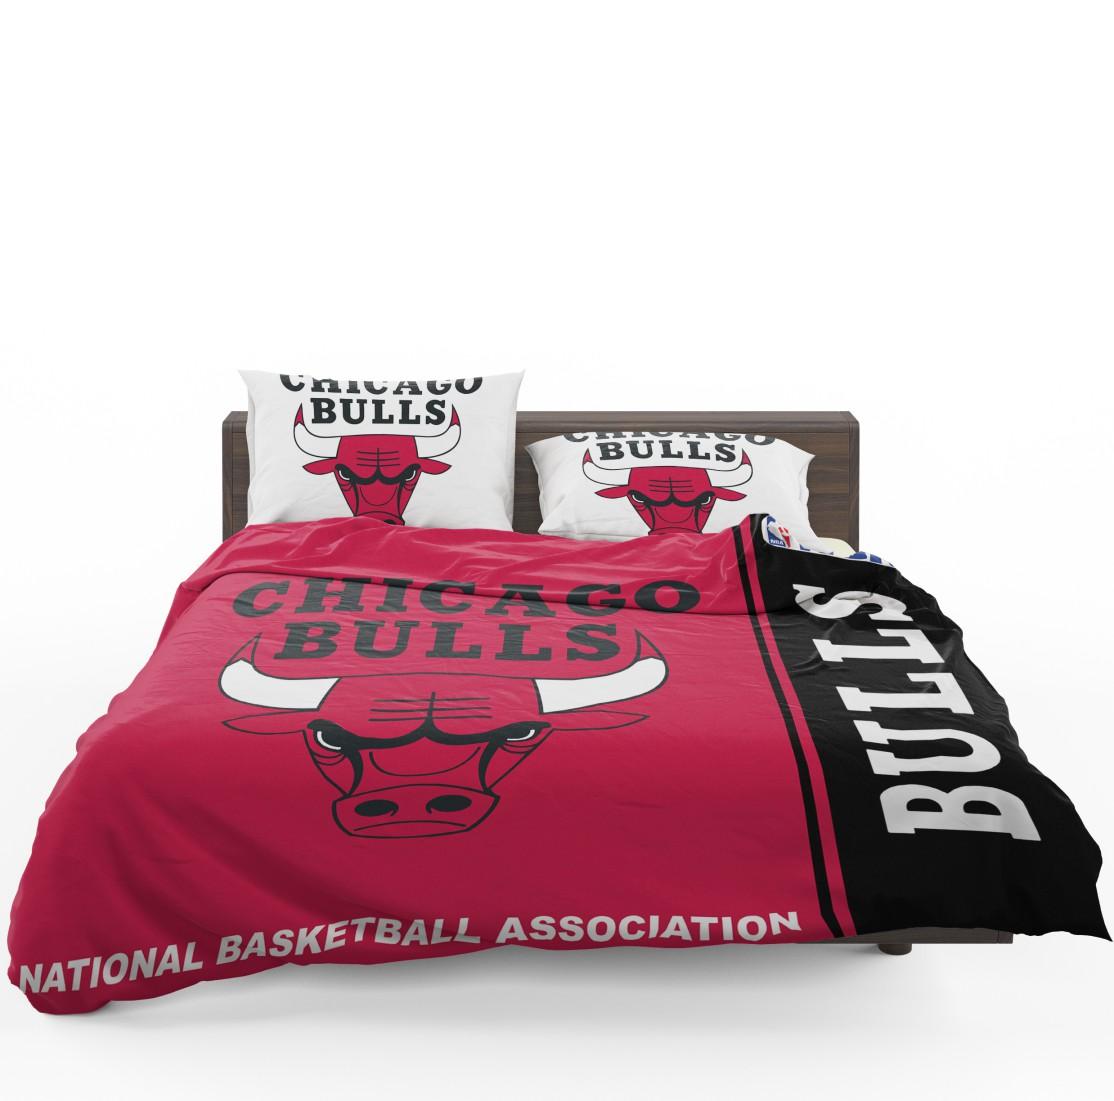 Chicago Bulls Nba Basketball Bedding Set Ebeddingsets